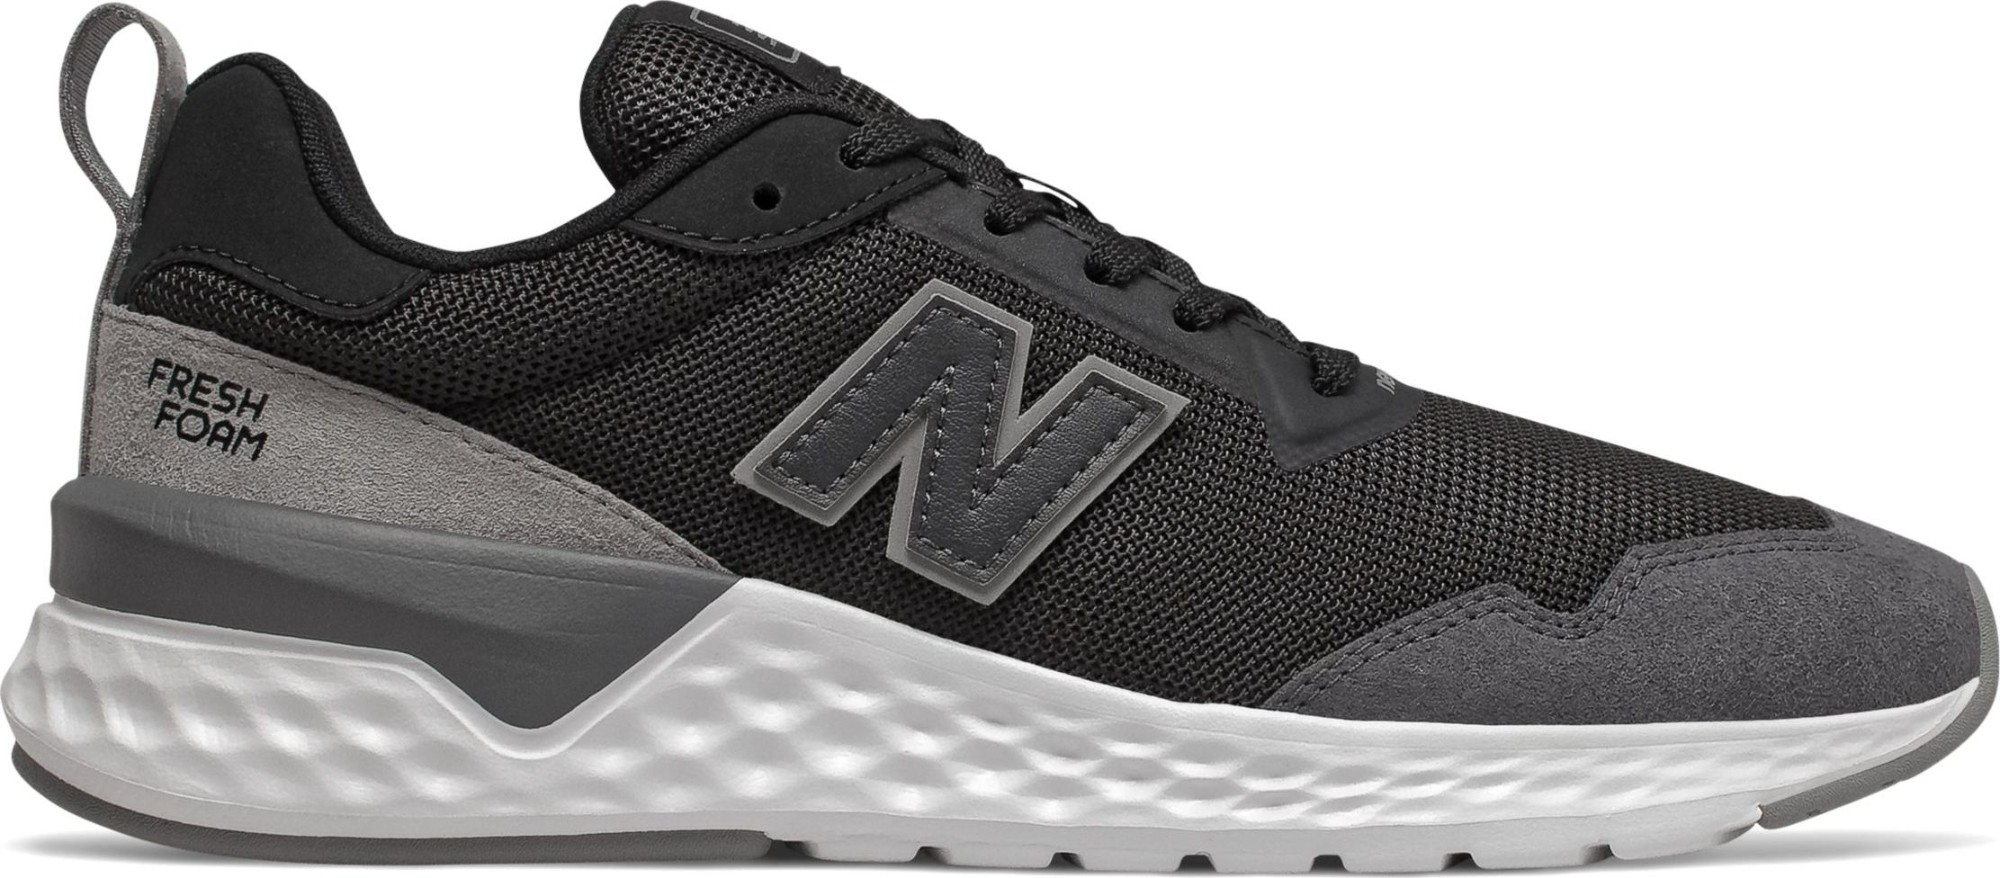 New Balance WS515 Black 37